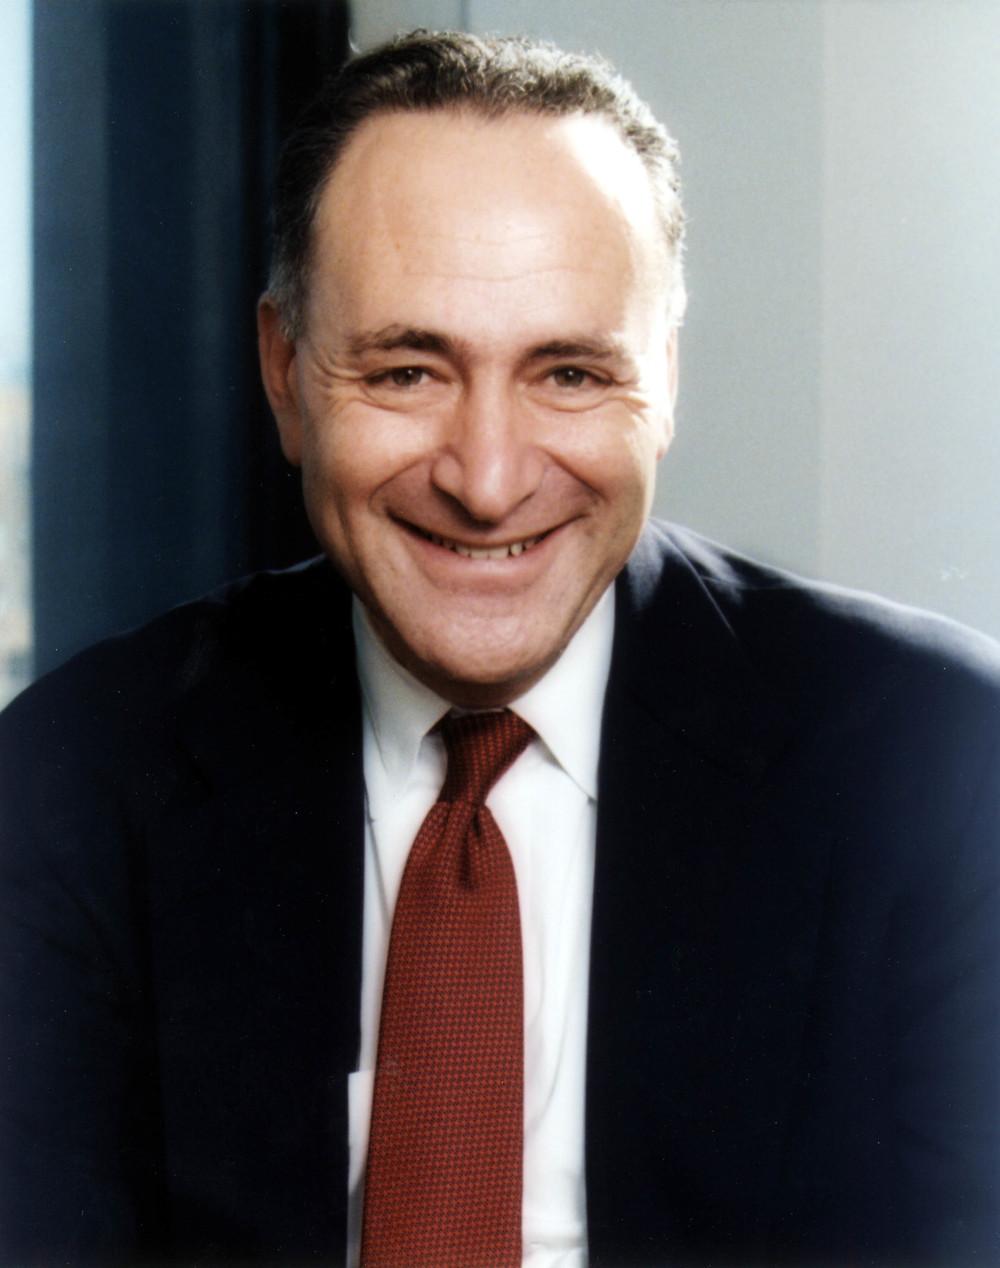 U.S. Sen. Chuck Schumer. Credit: U.S. Congress.